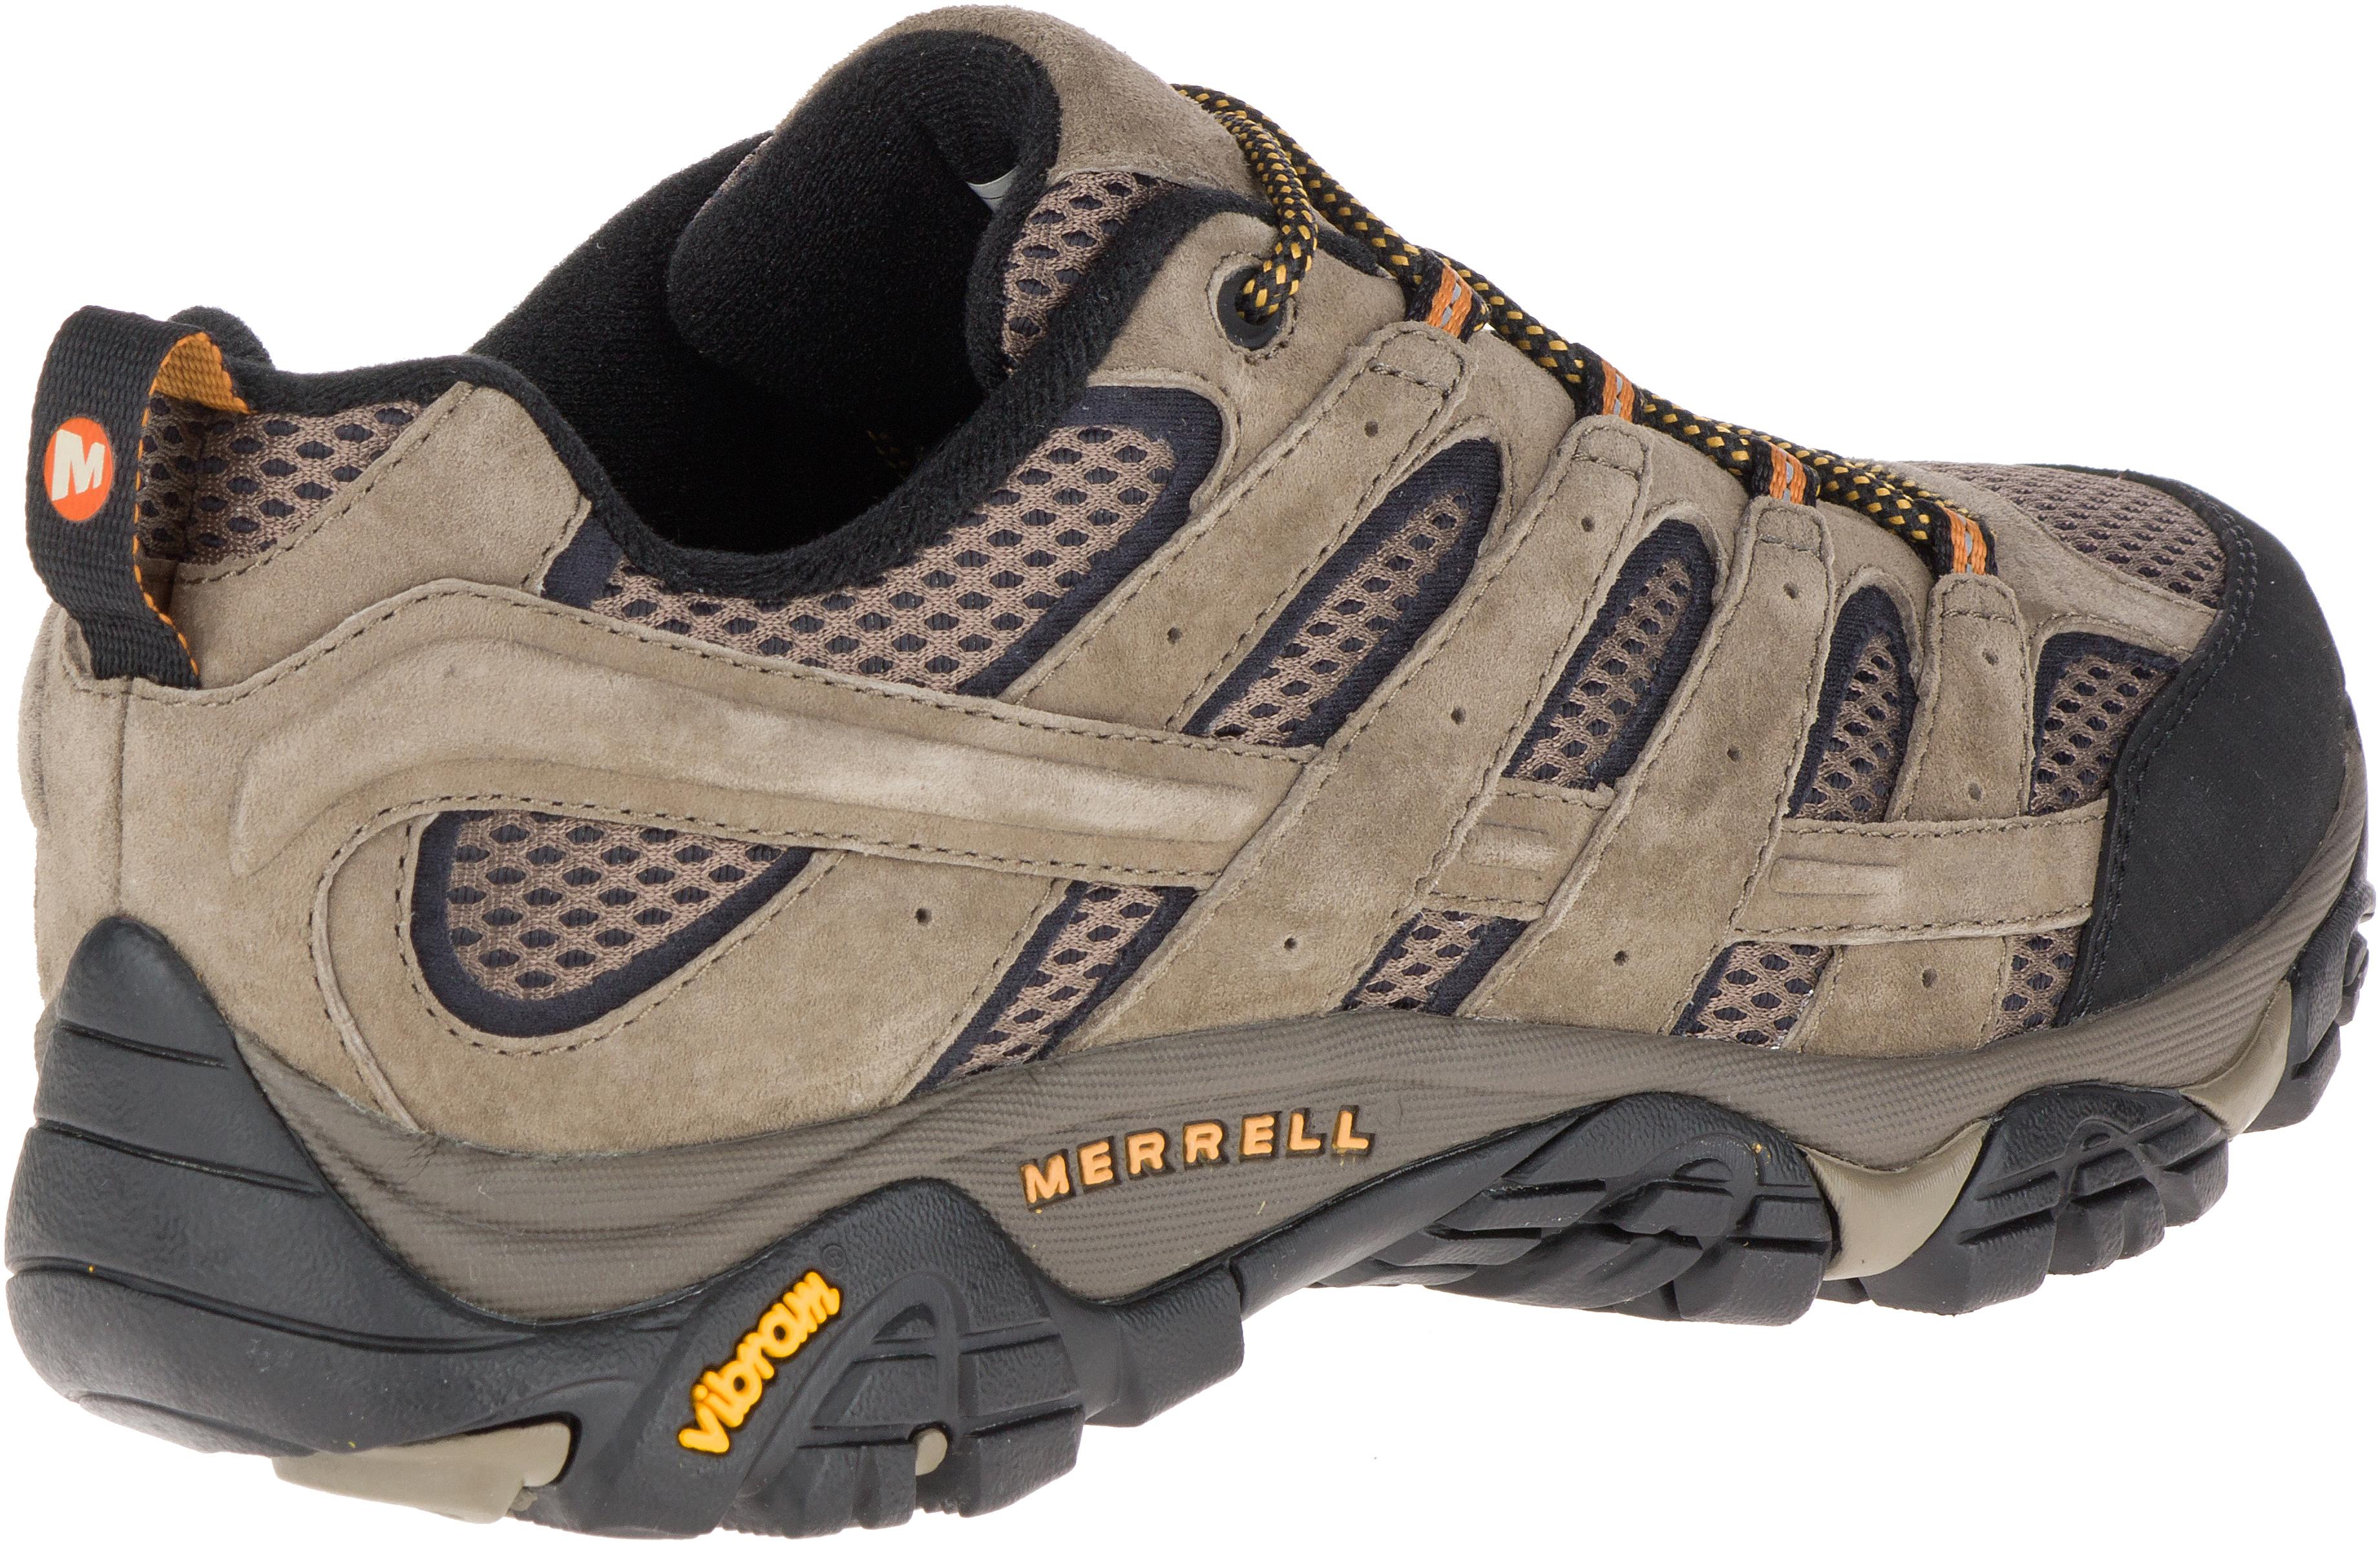 6fd09678c7b Merrell Moab 2 Vent Light Trail Shoes - Men's | MEC